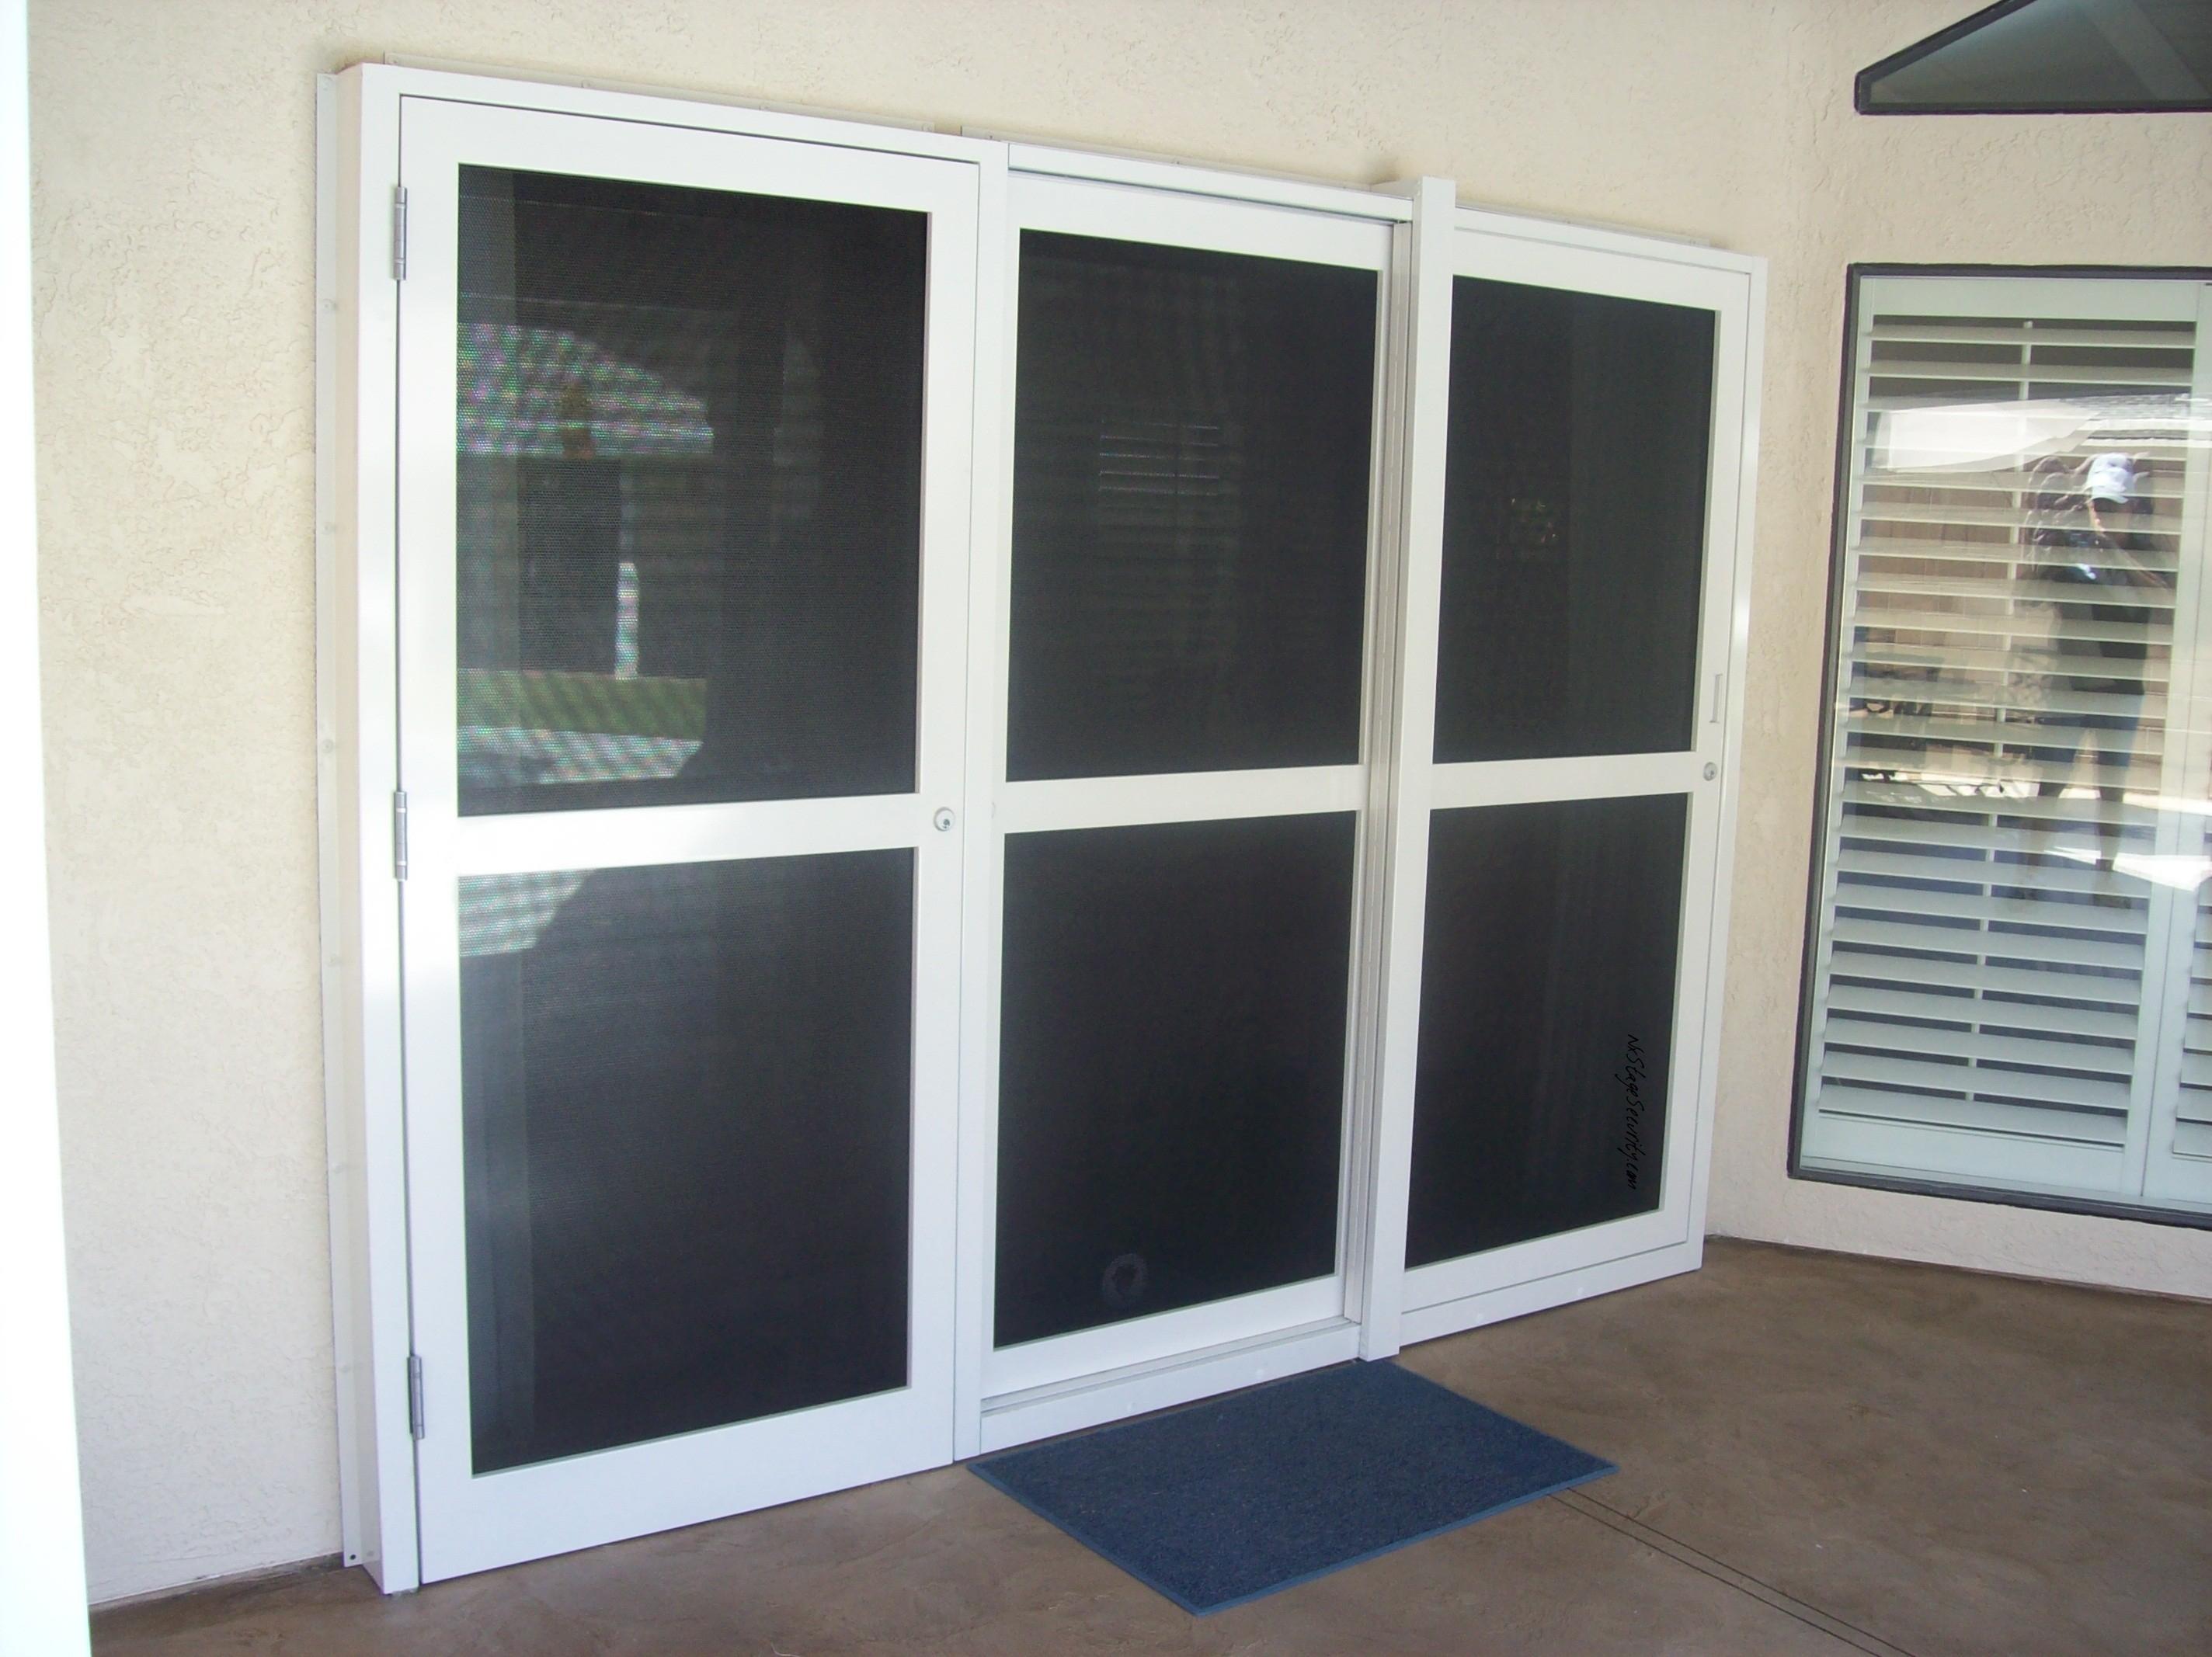 Security Patio Sliding Glass Doors2848 X 2134